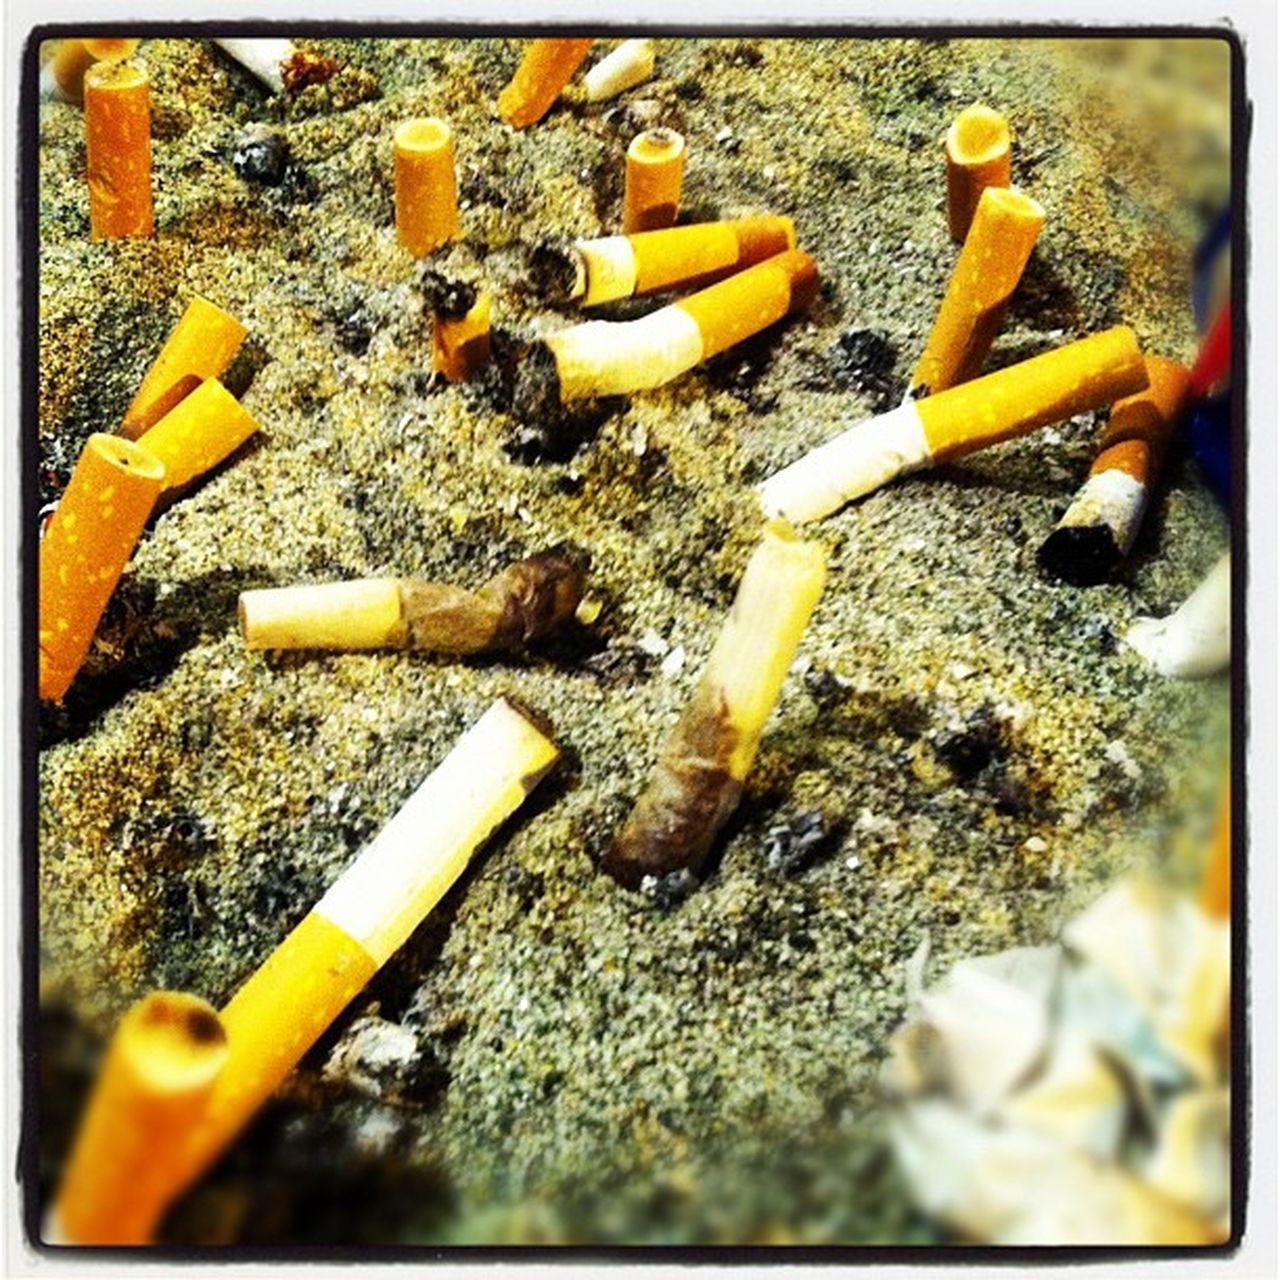 Cemetery Tortona Instamood Instaily Instagood instaitalia instatortona cigarette sigarette smoke instart tobacco tabacco now sand sabbia instapiemonte art death